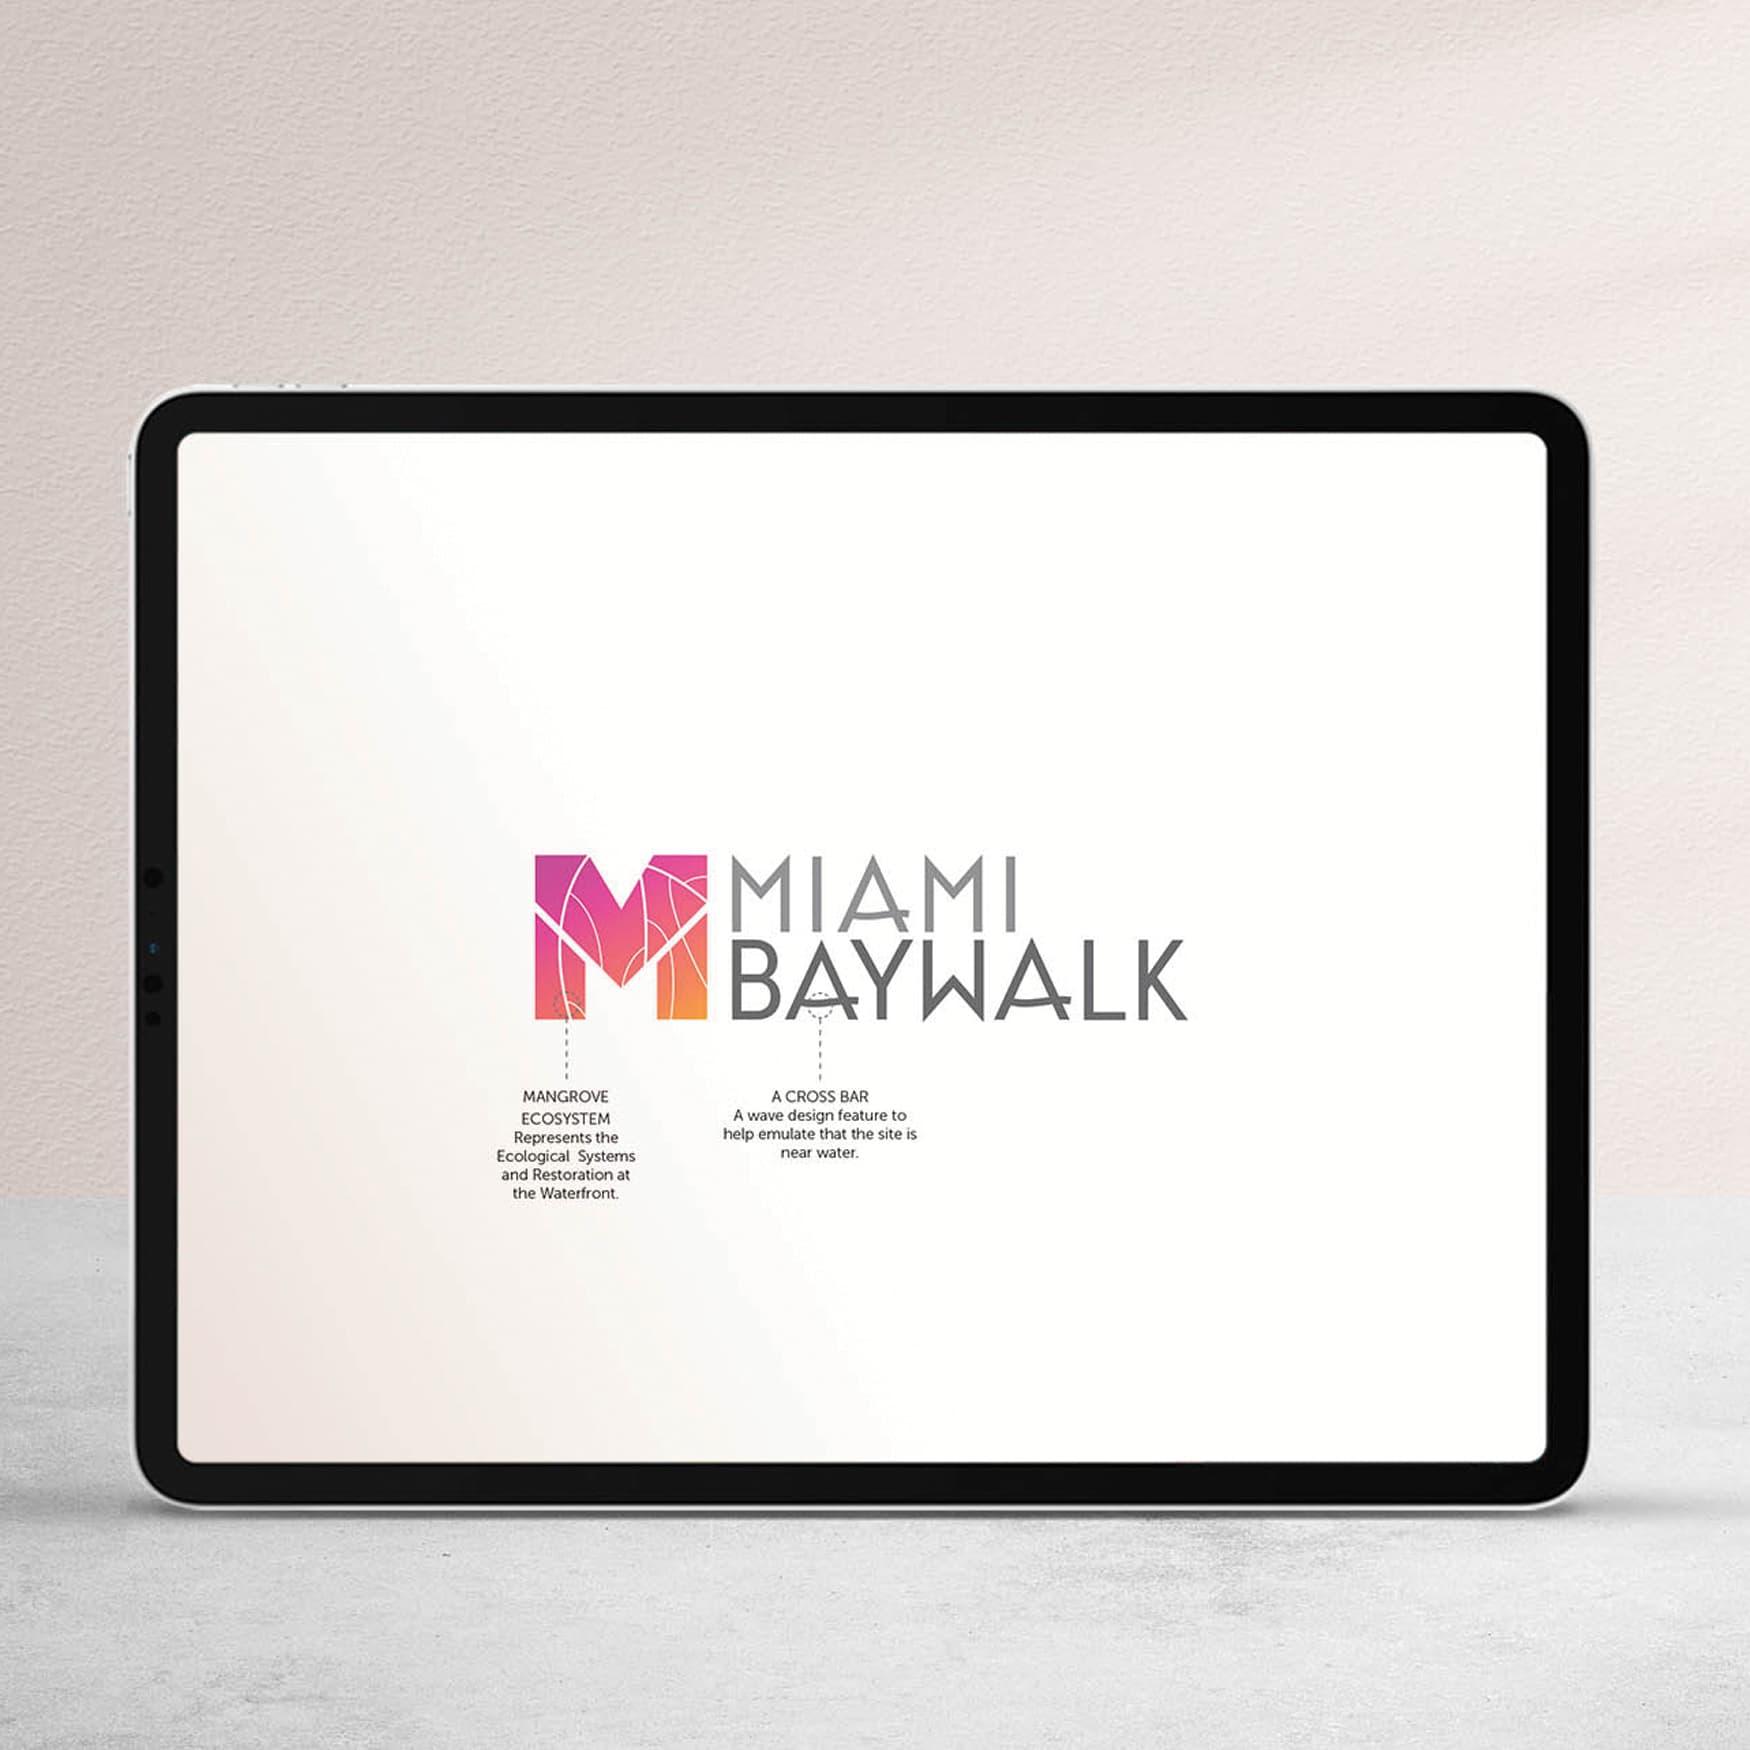 Miami Baywalk Waterfront Design Digital Branding